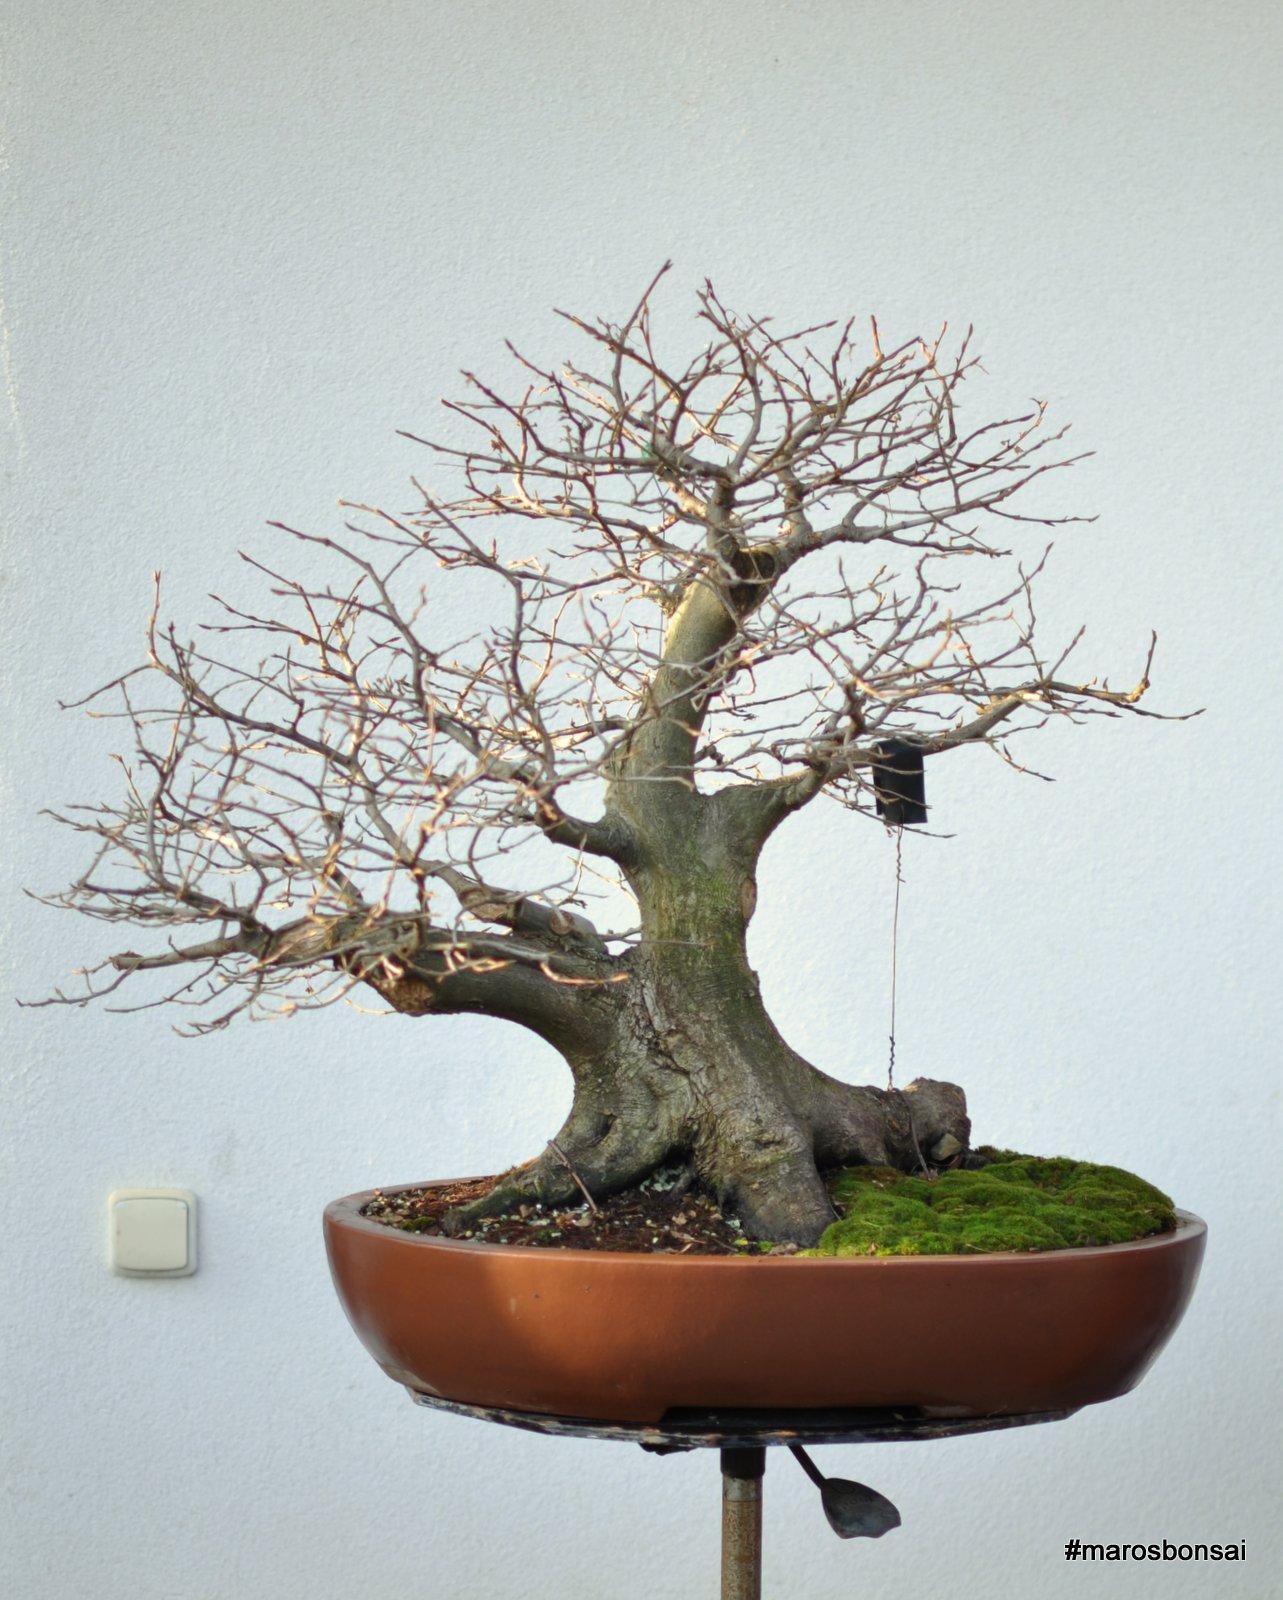 Maros Bonsai Blog Story Of My Bonsai Tree Hornbeam No11 QuotThe